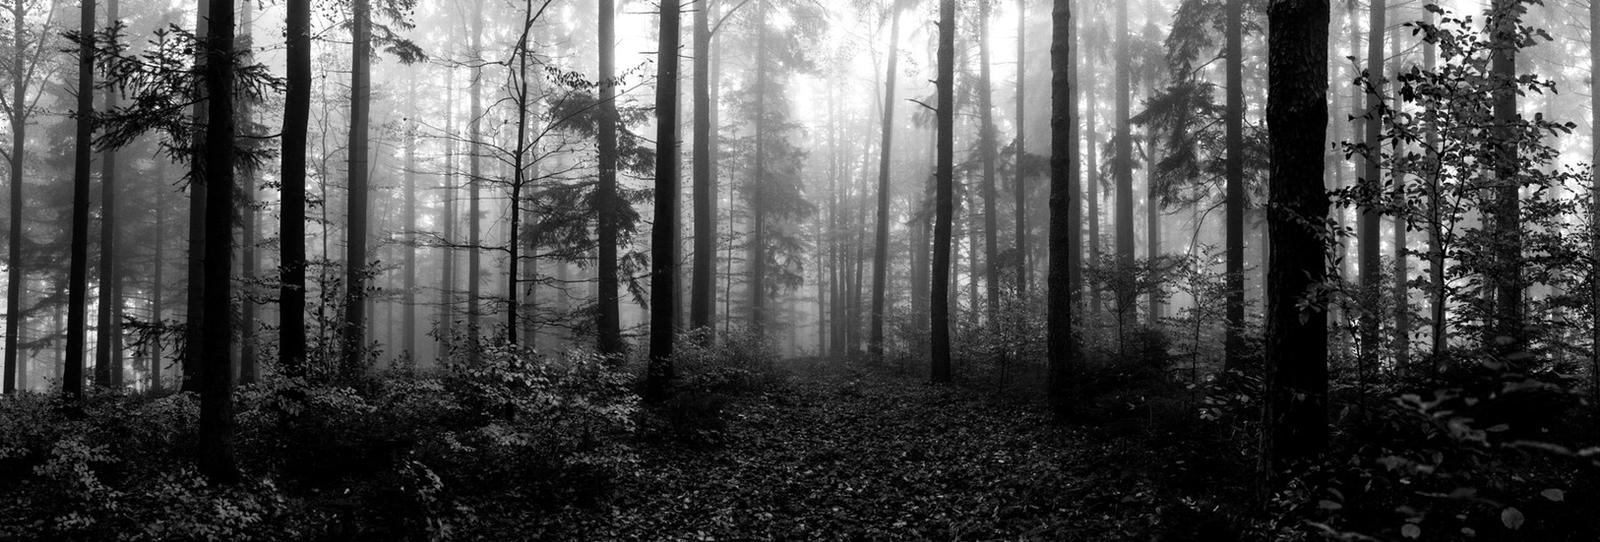 nebel impressionen - 4 by VooDooMania